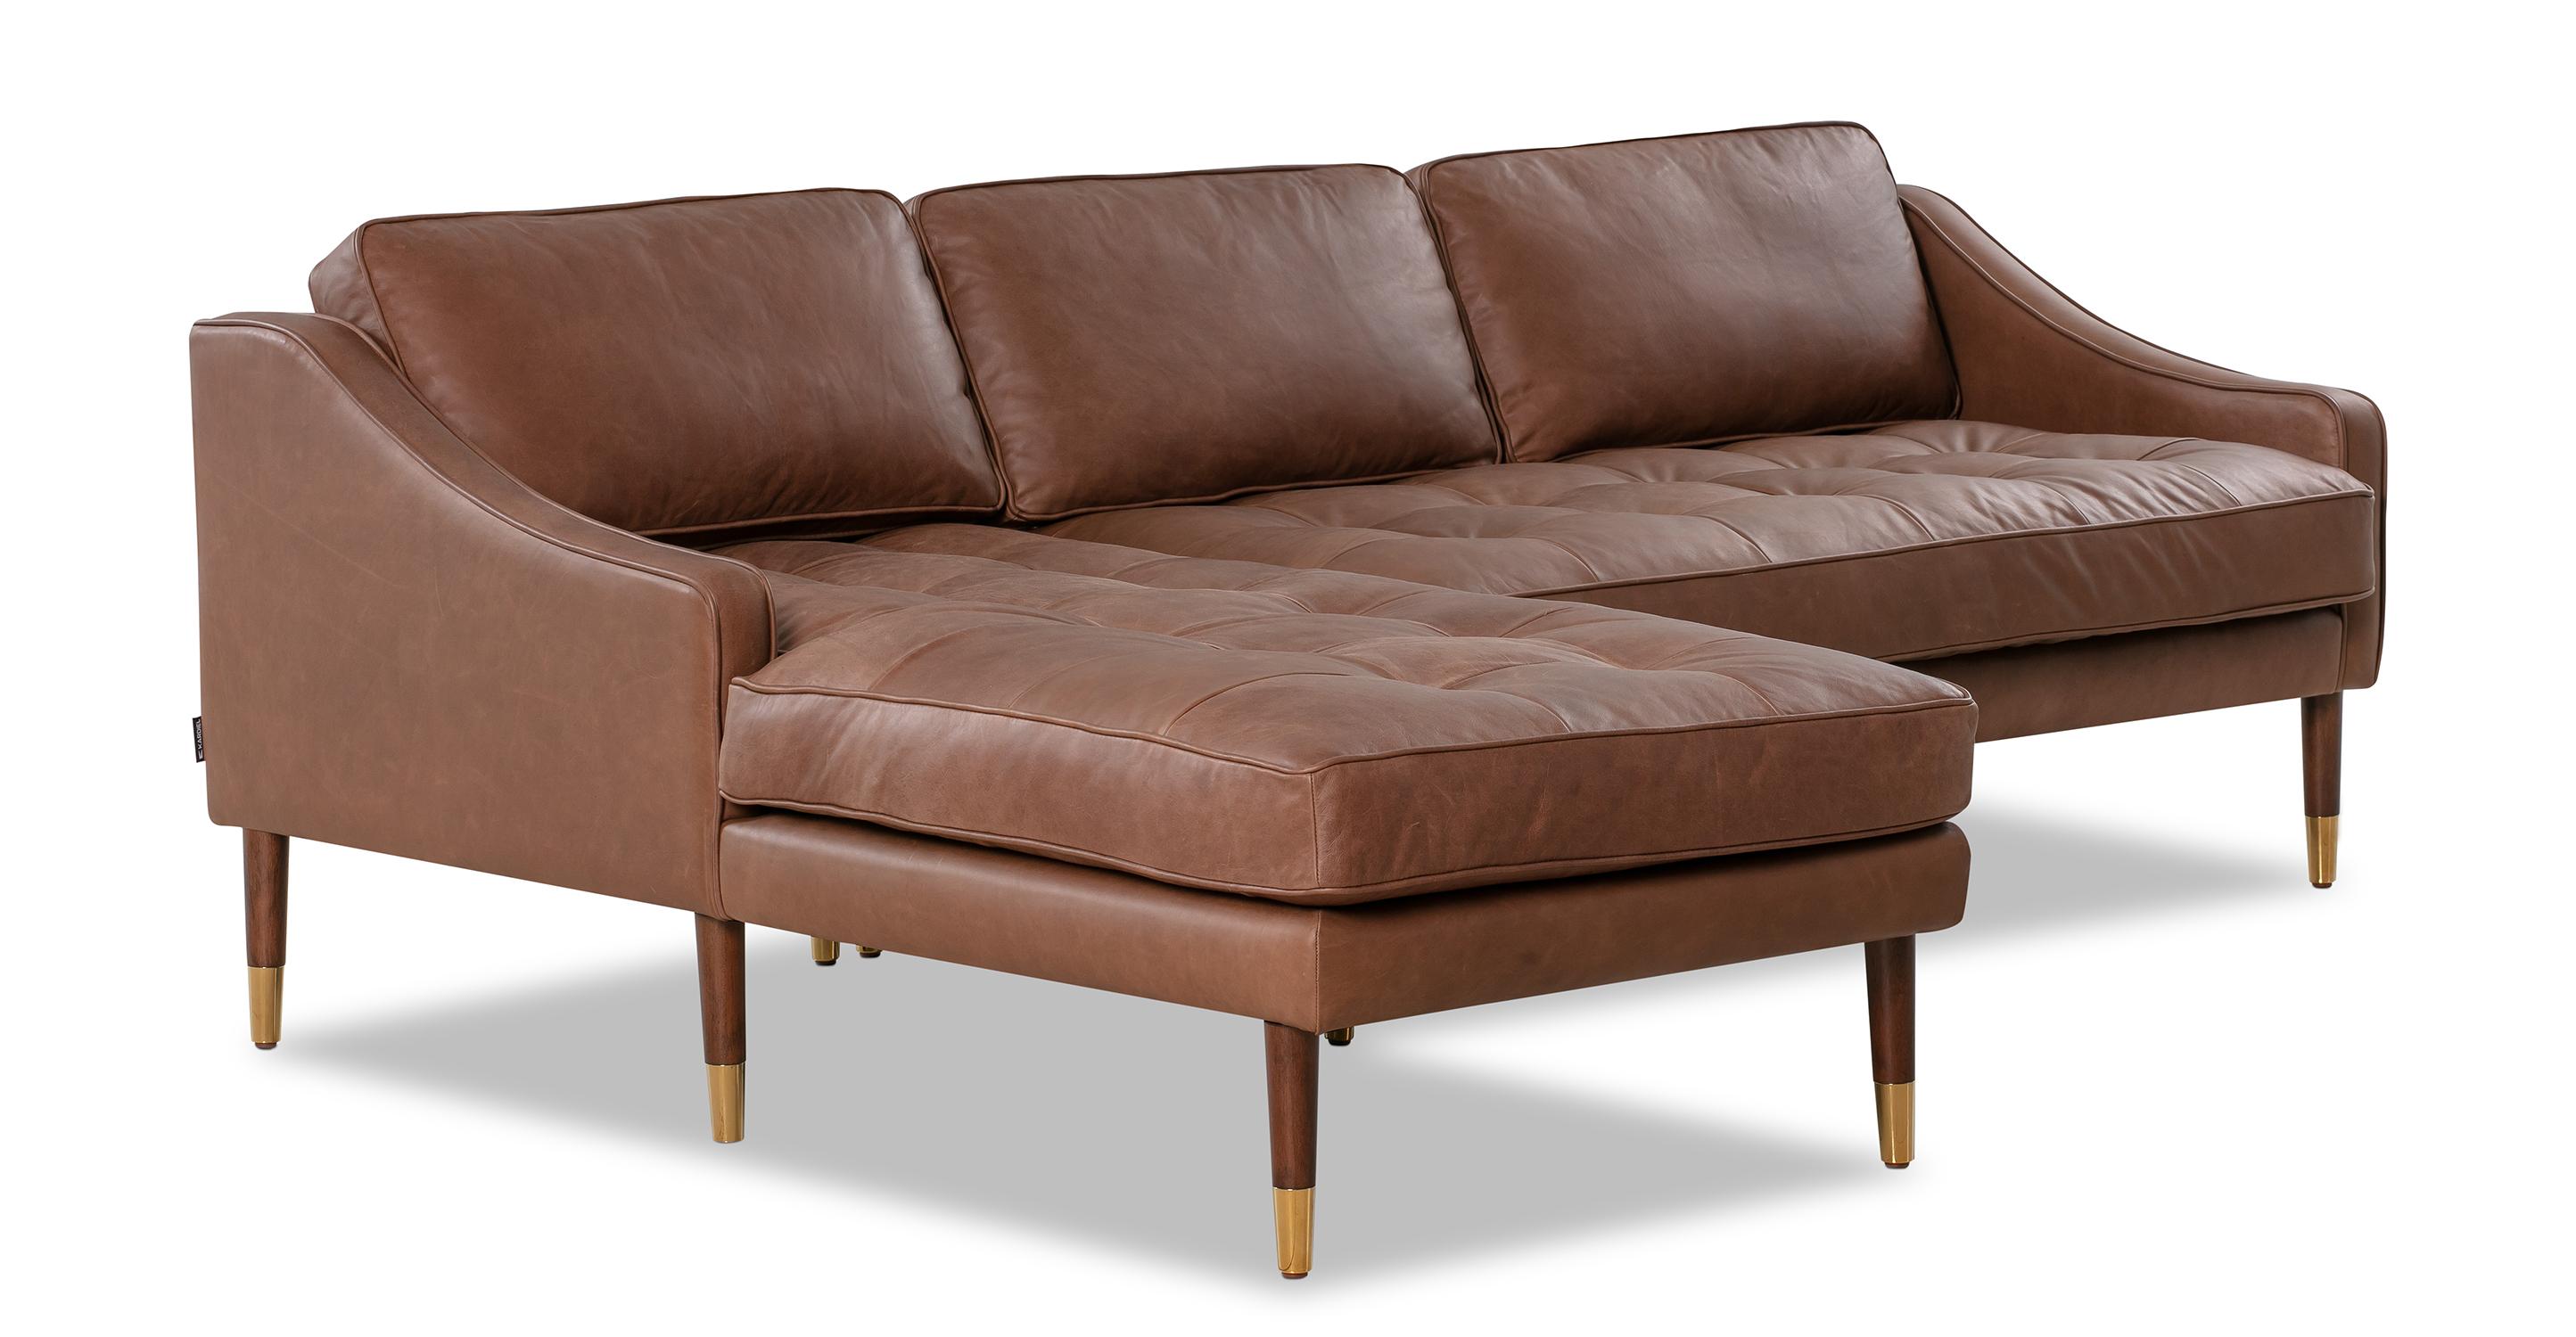 "Brando 83"" Leather Sofa Sectional Left, Milano Mocha"